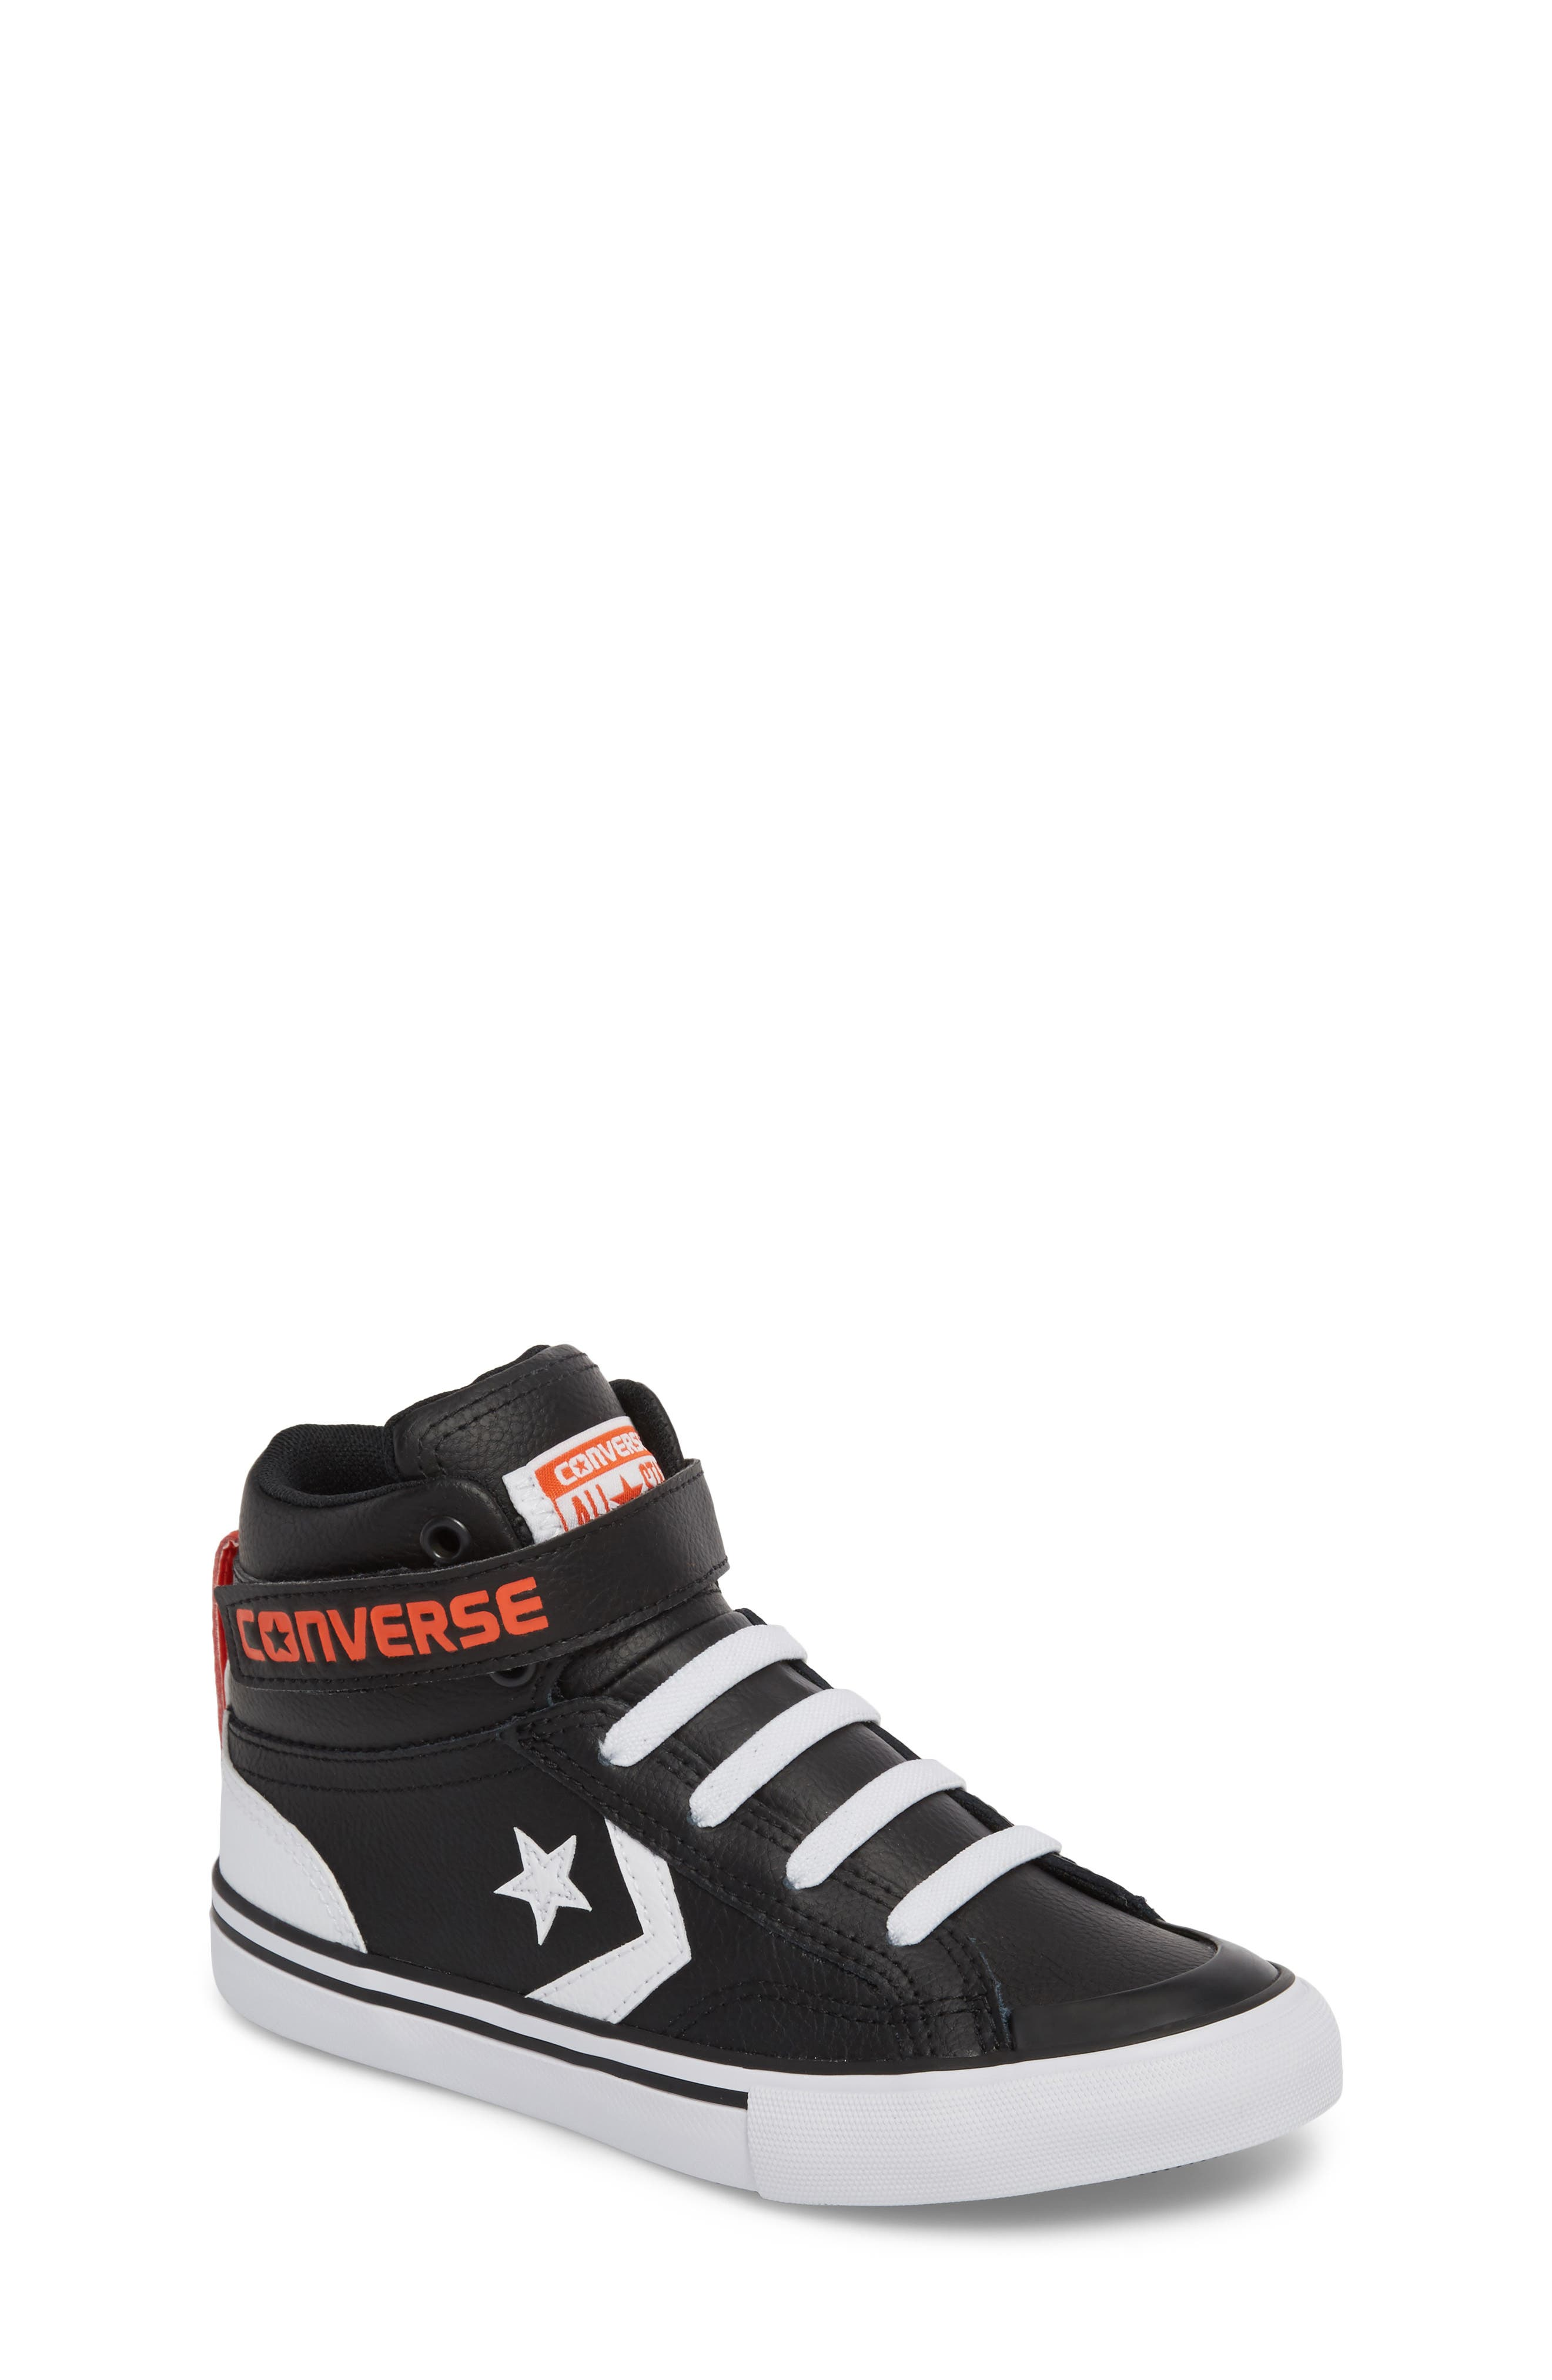 Converse Pro Blaze High Top Sneaker (Baby, Walker, Toddler, Little Kid & Big Kid)